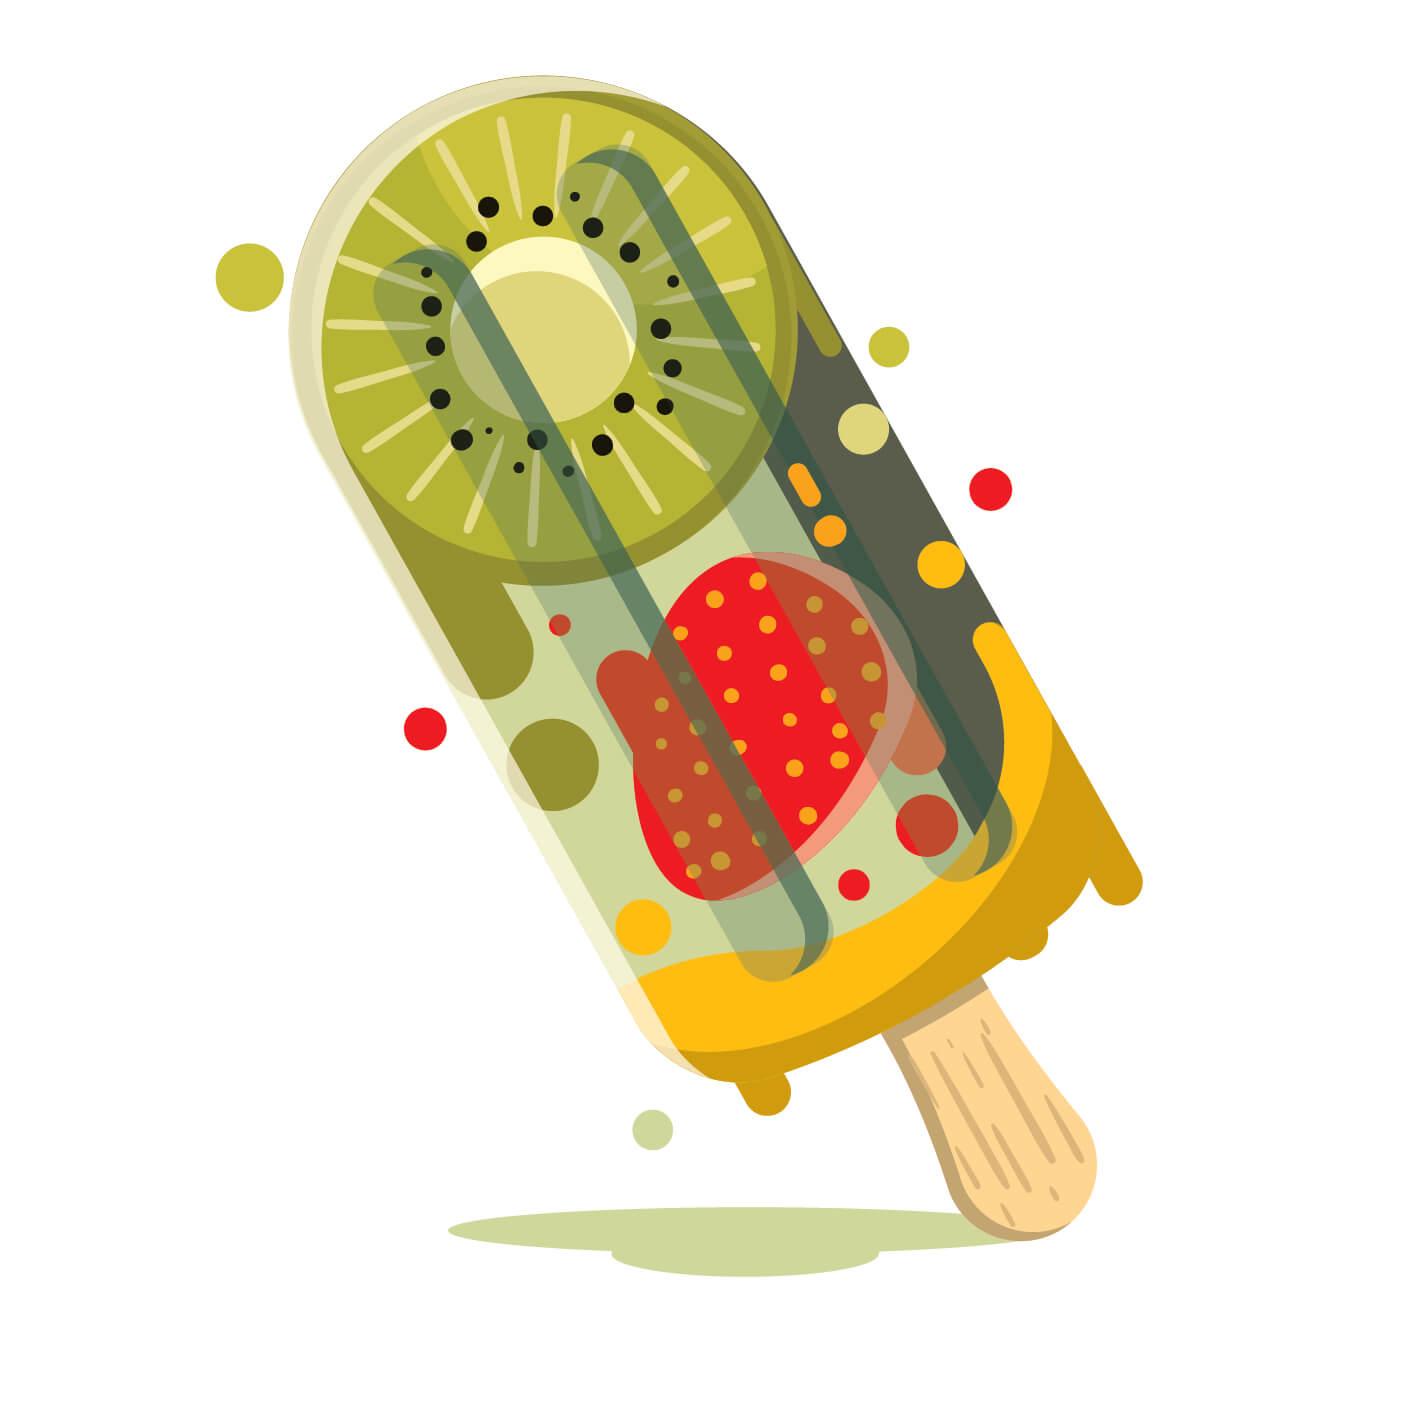 Fresh Ice Cream Stick In Summer Wallpaper Vector: Fun Illustration Of Summer Fruits Popsicle